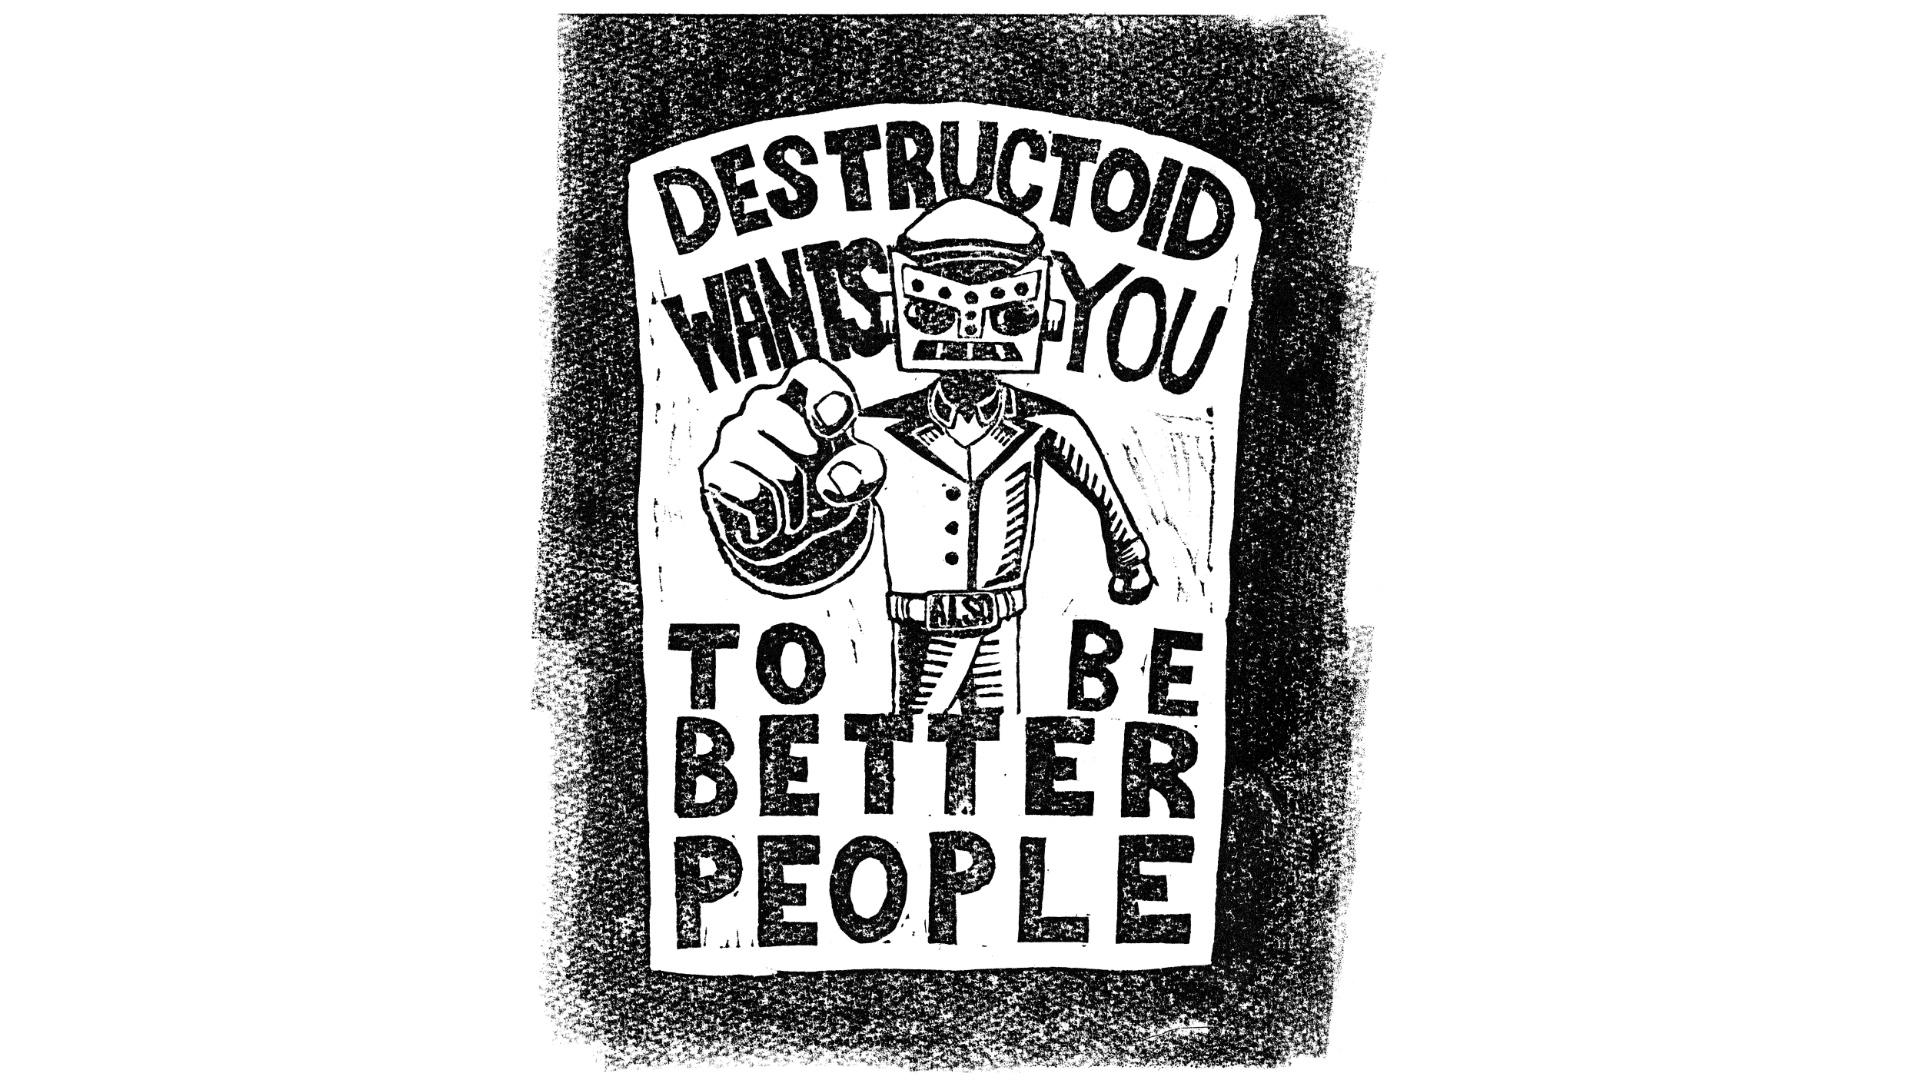 We're bringing back two old school Destructoid shirts screenshot